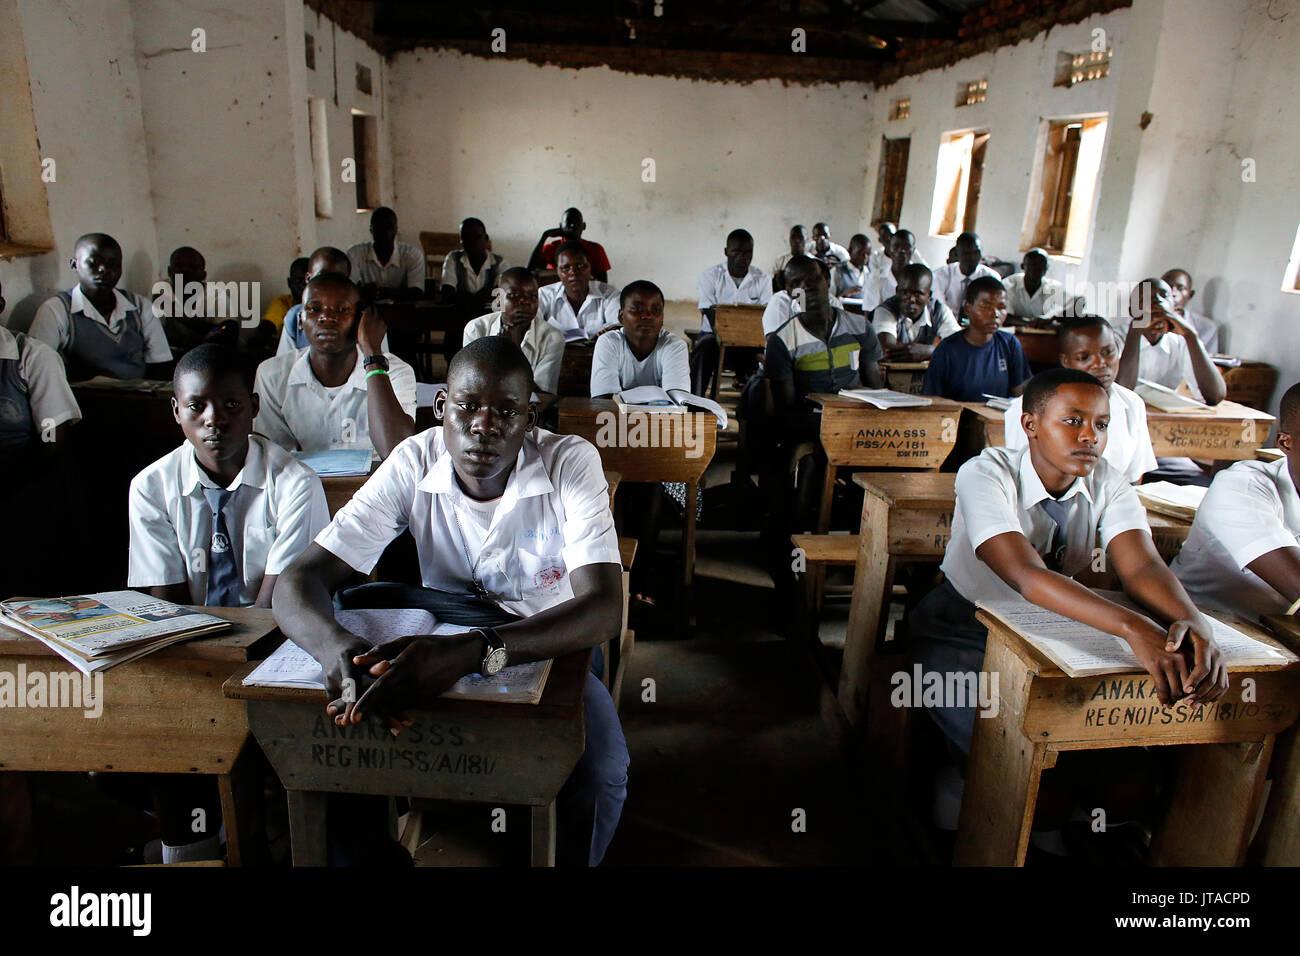 Anaka senior secondary school, Anaka, Uganda, Africa - Stock Image